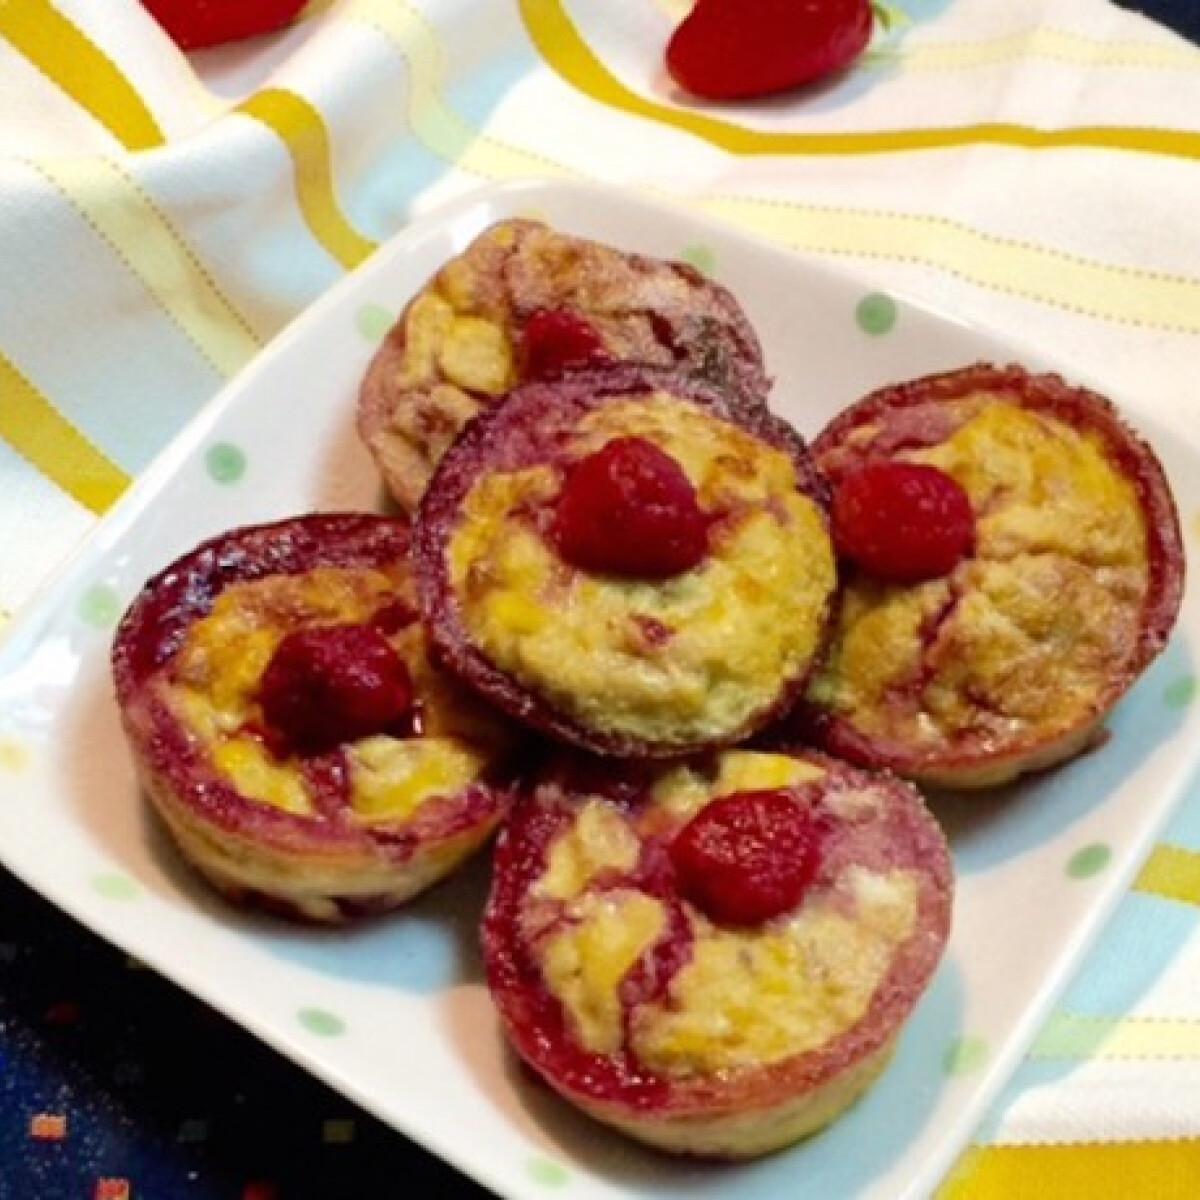 Diétás reform muffin 3 alapanyagból